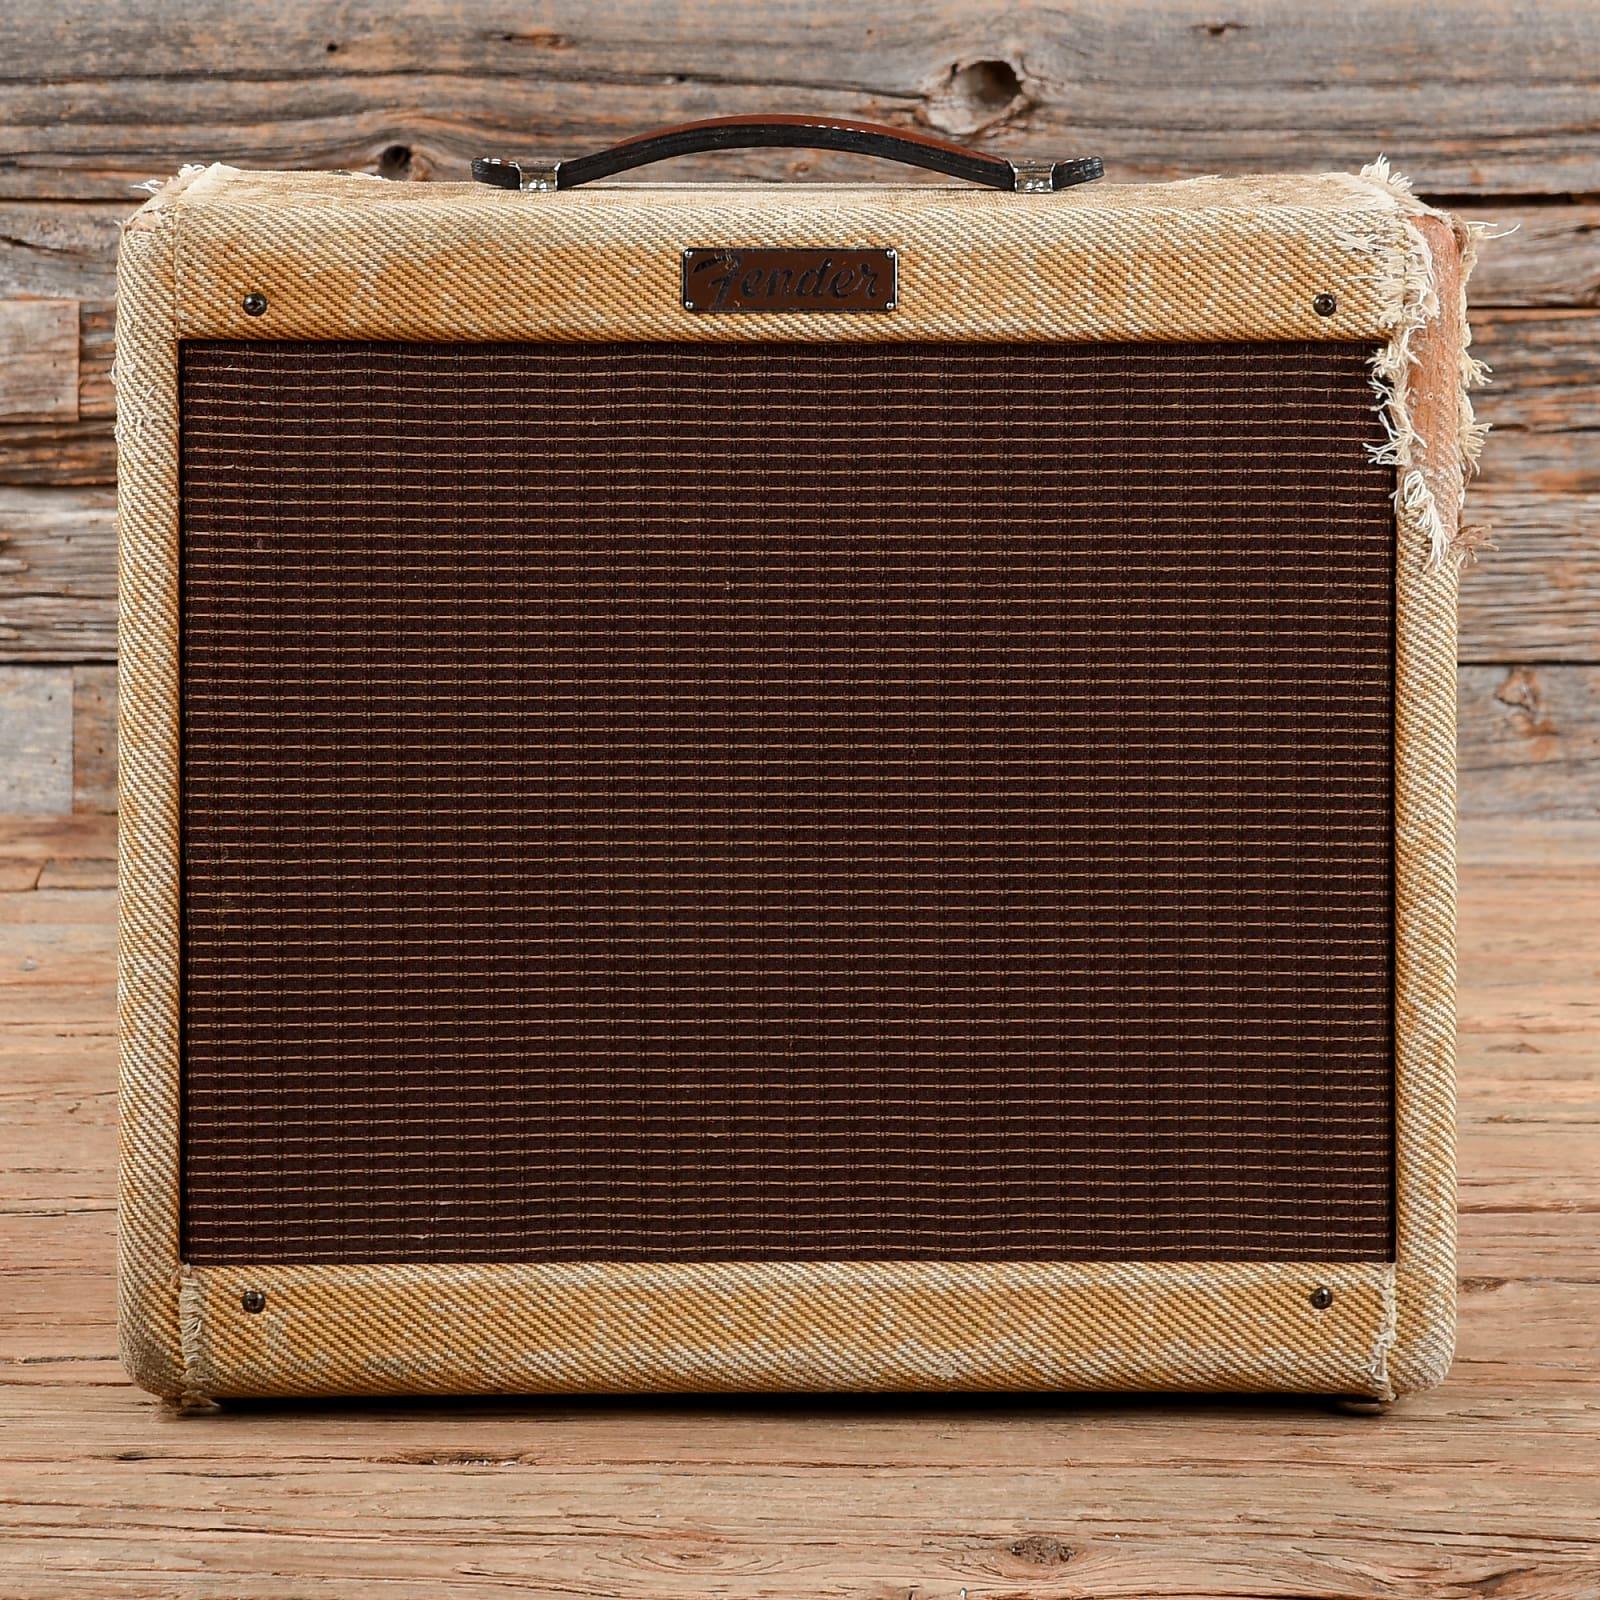 Fender Princeton-Amp 1957 (s820)